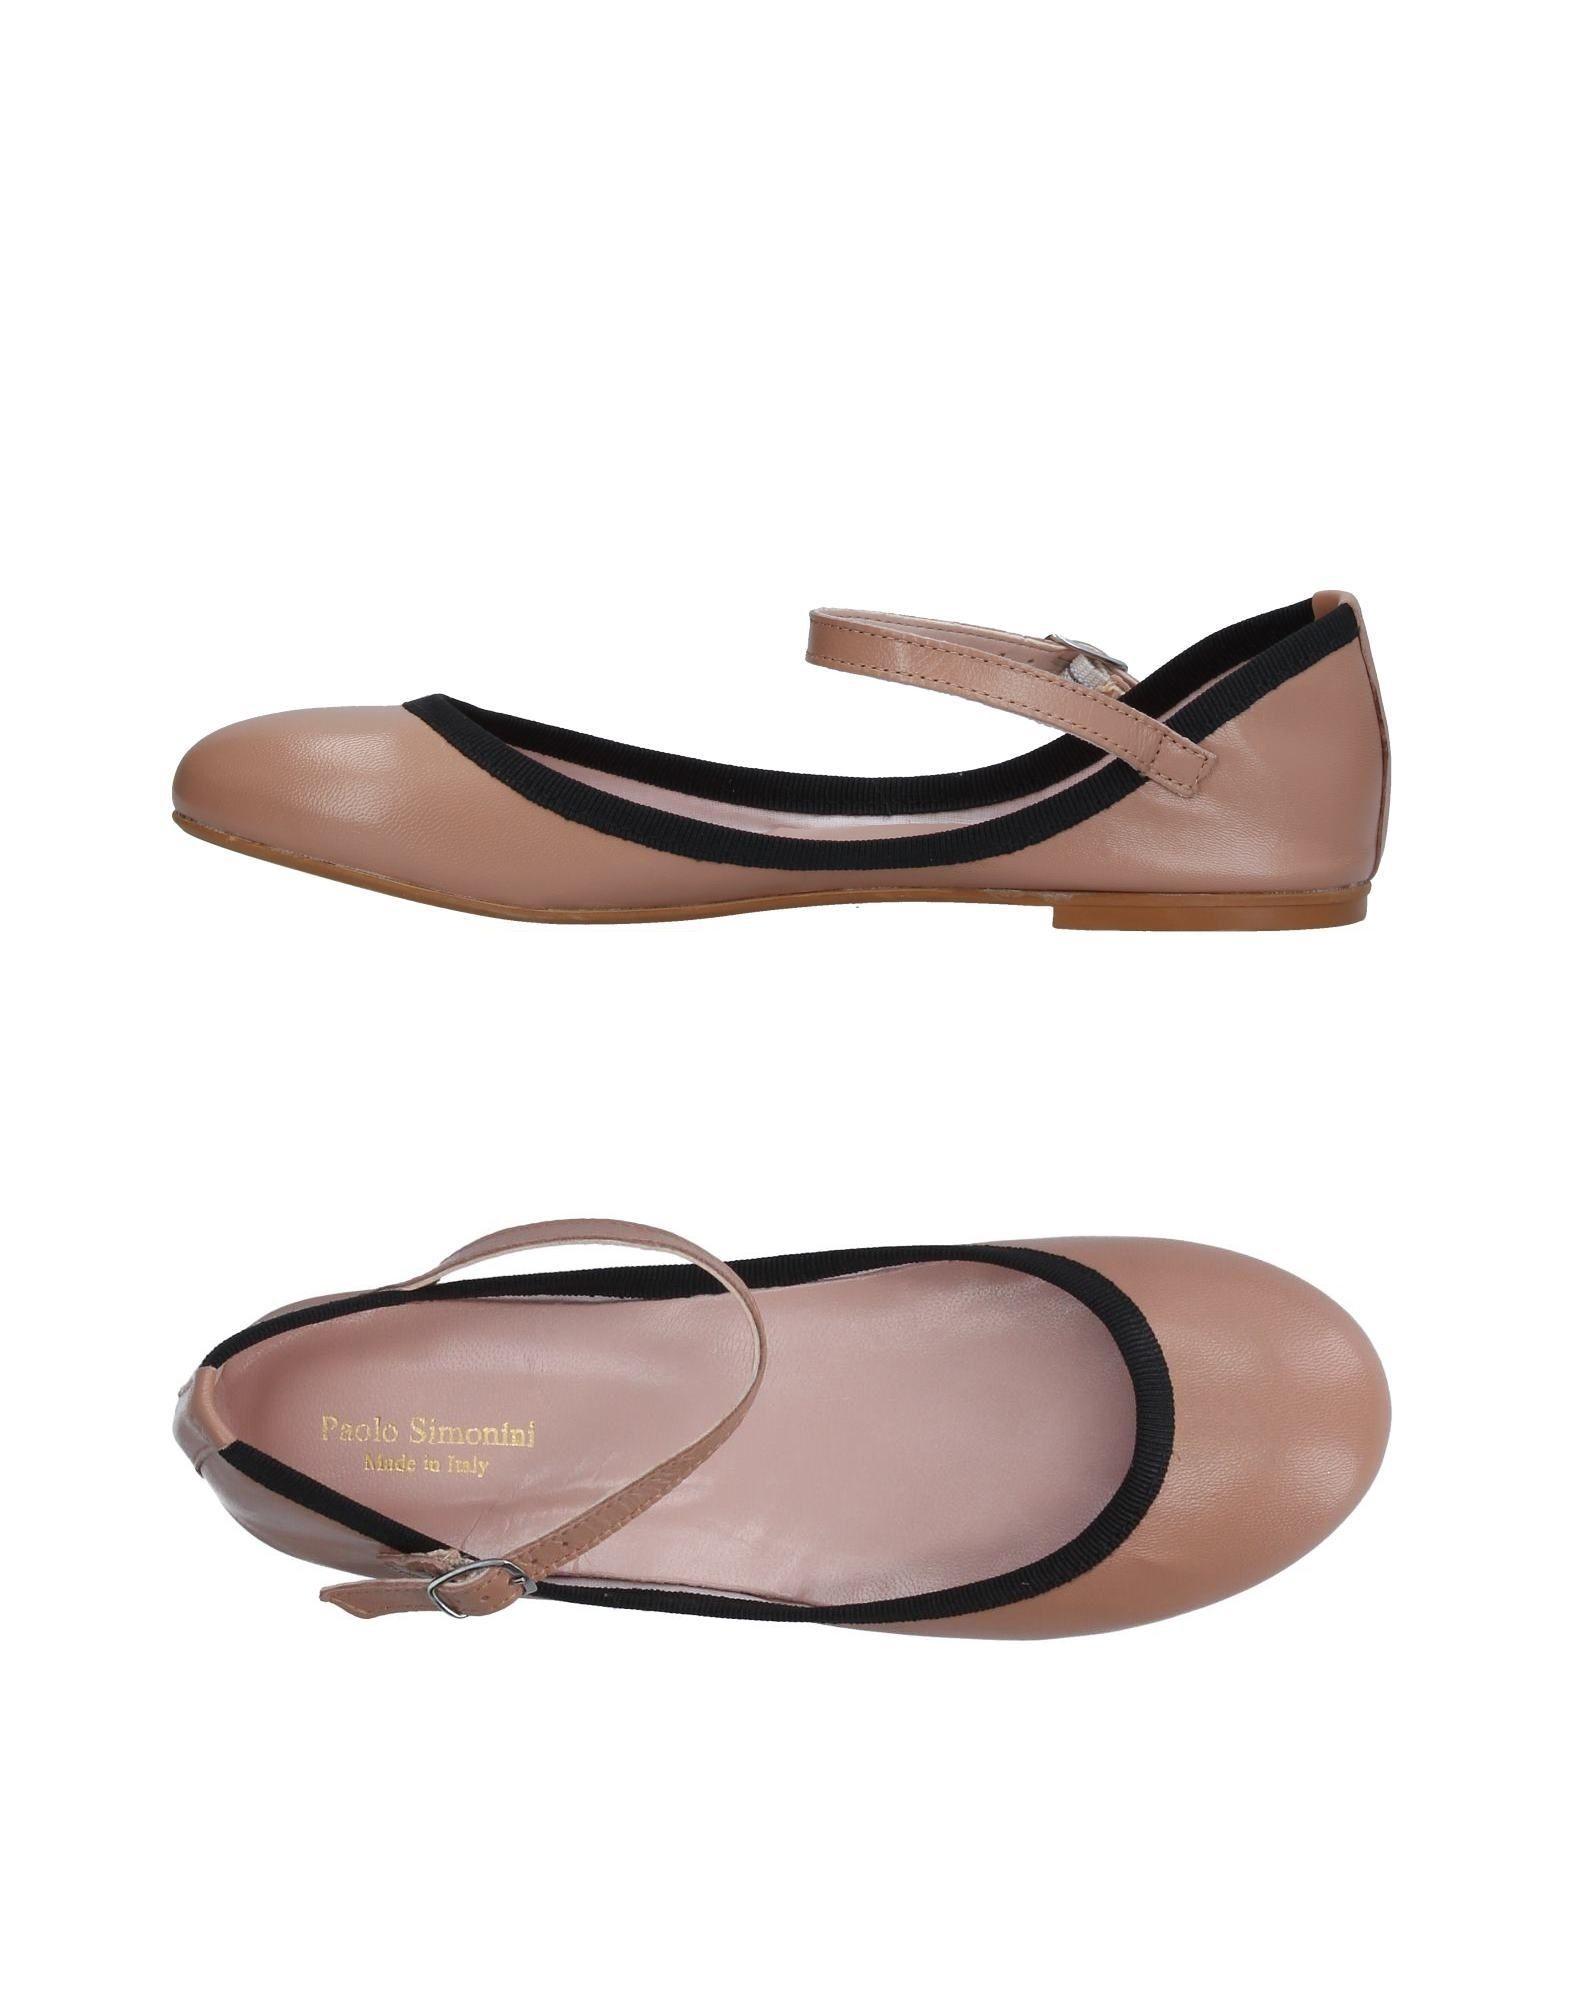 Paolo Simonini Ballerinas Damen  11378061AB Gute Qualität beliebte Schuhe